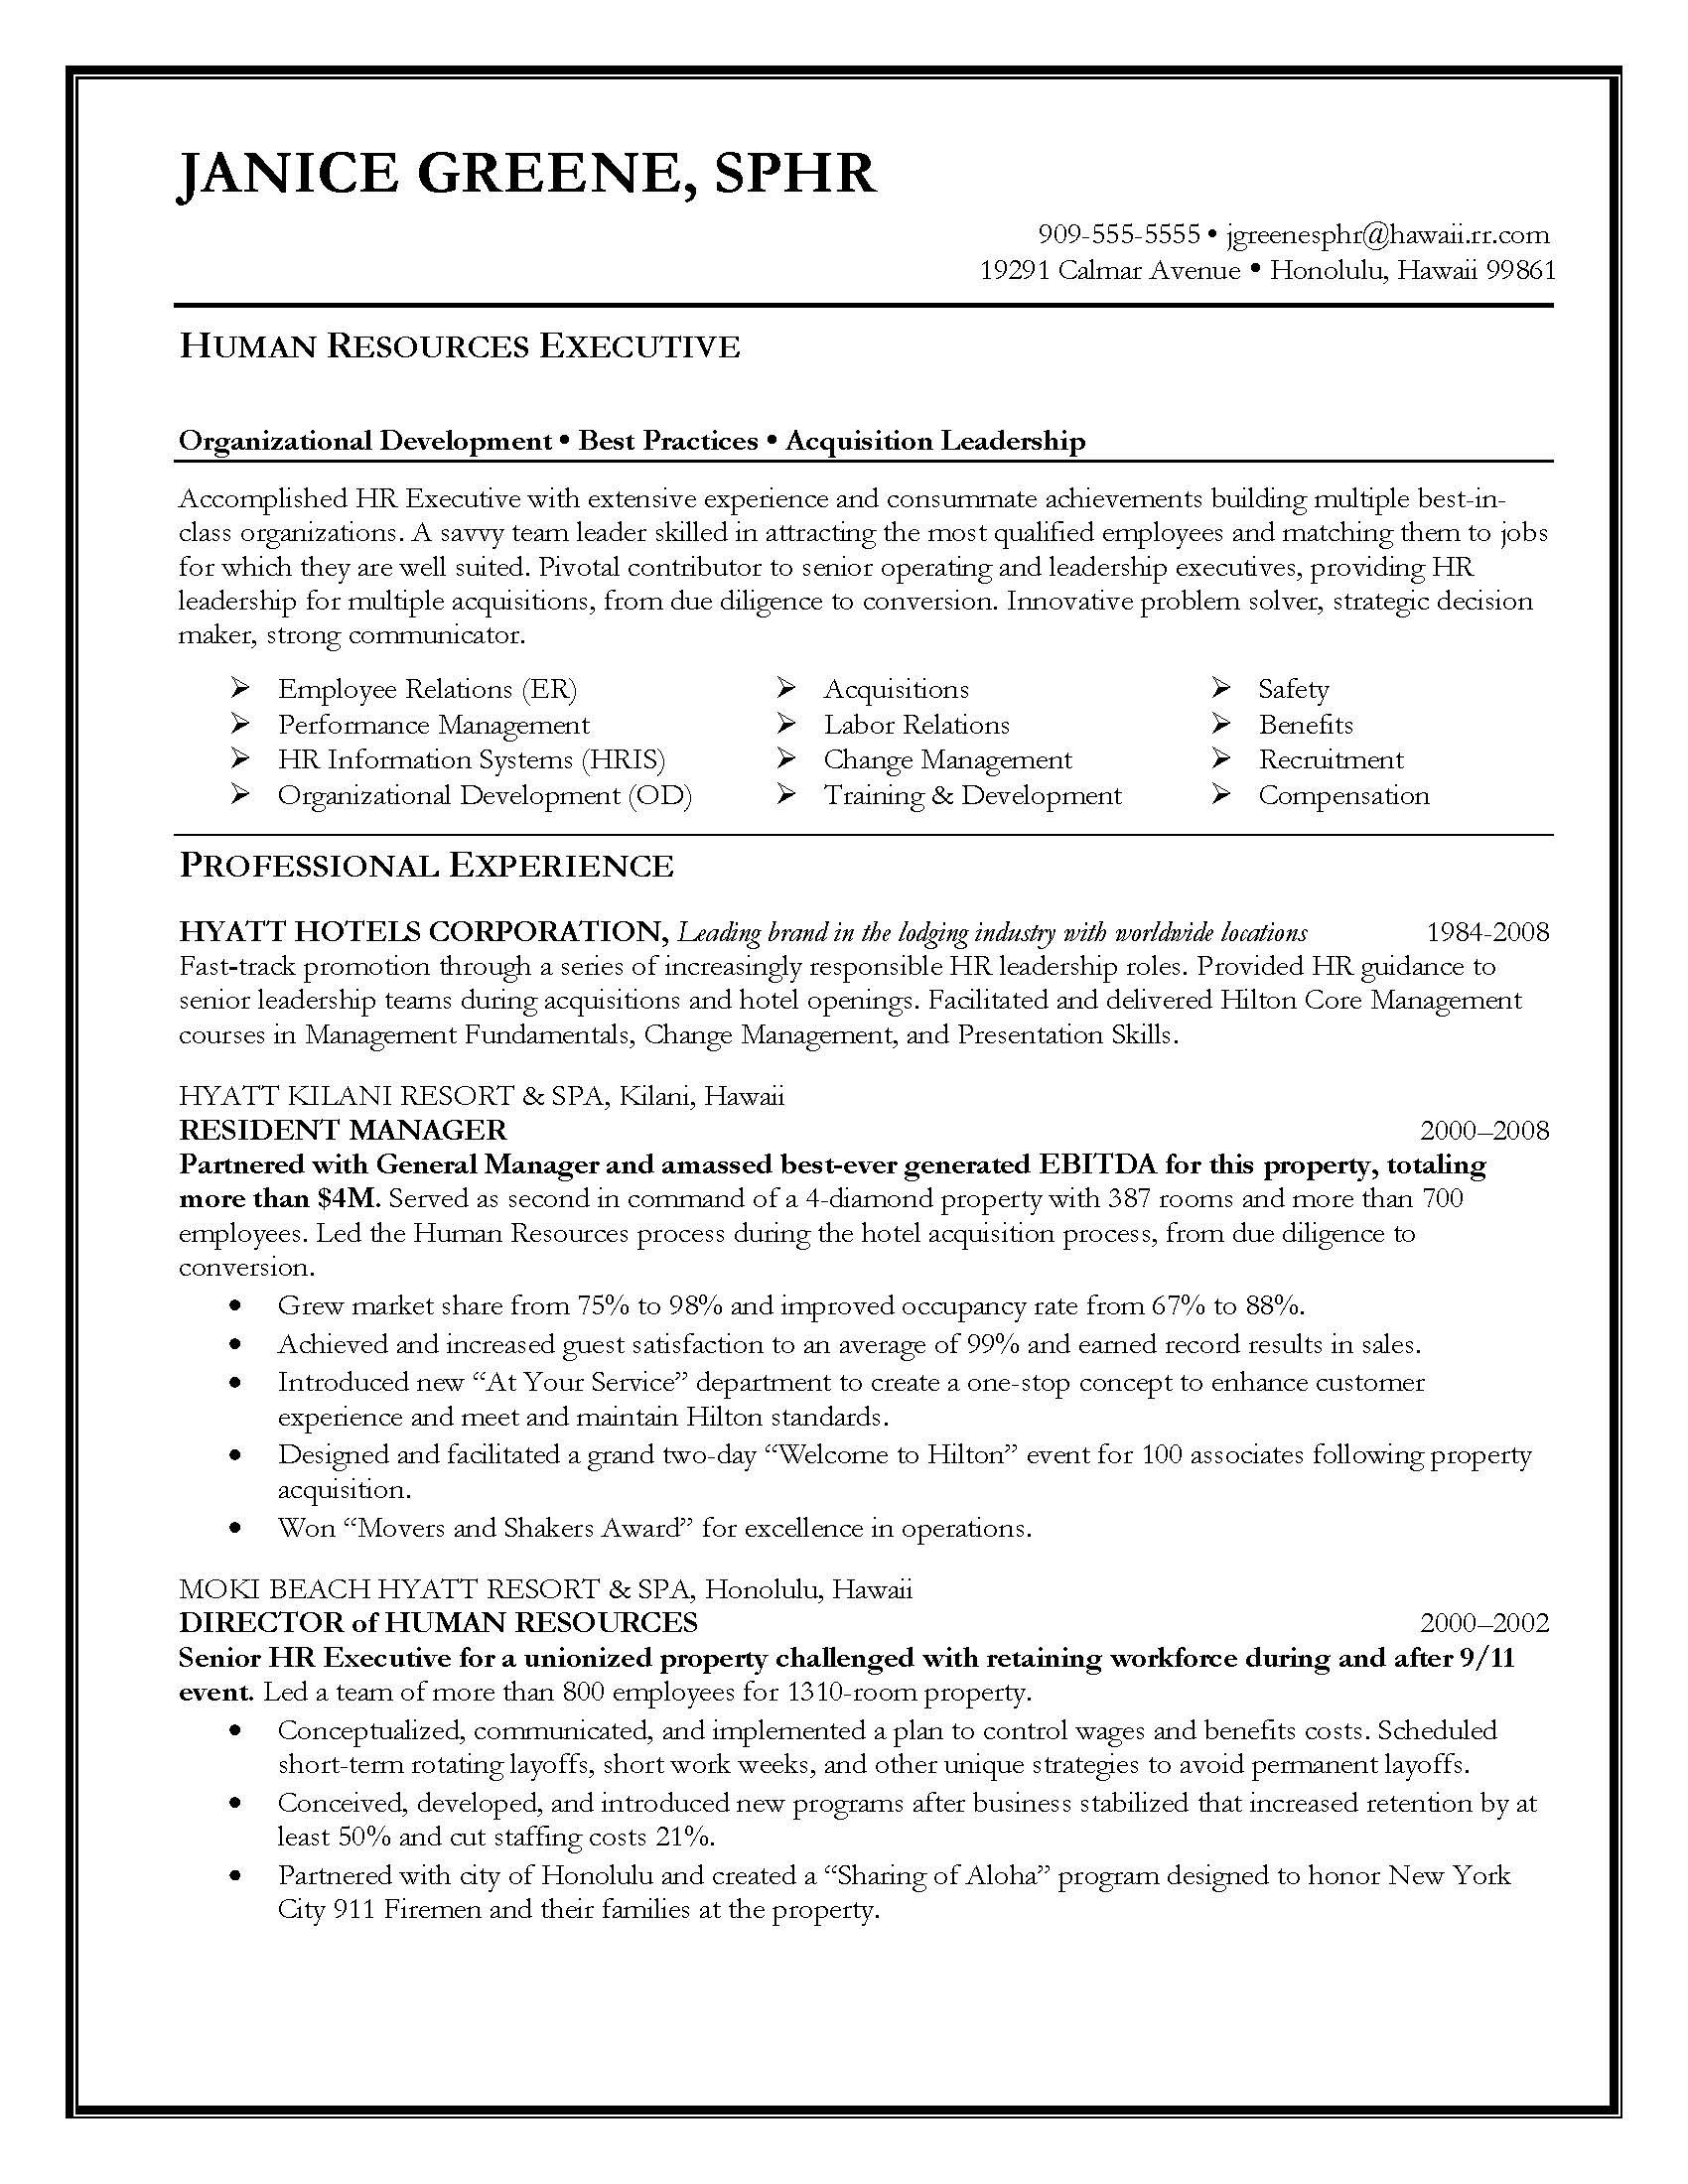 Free Sample Resumes U2013 Resume Writing Tips U2013 Writing U2026